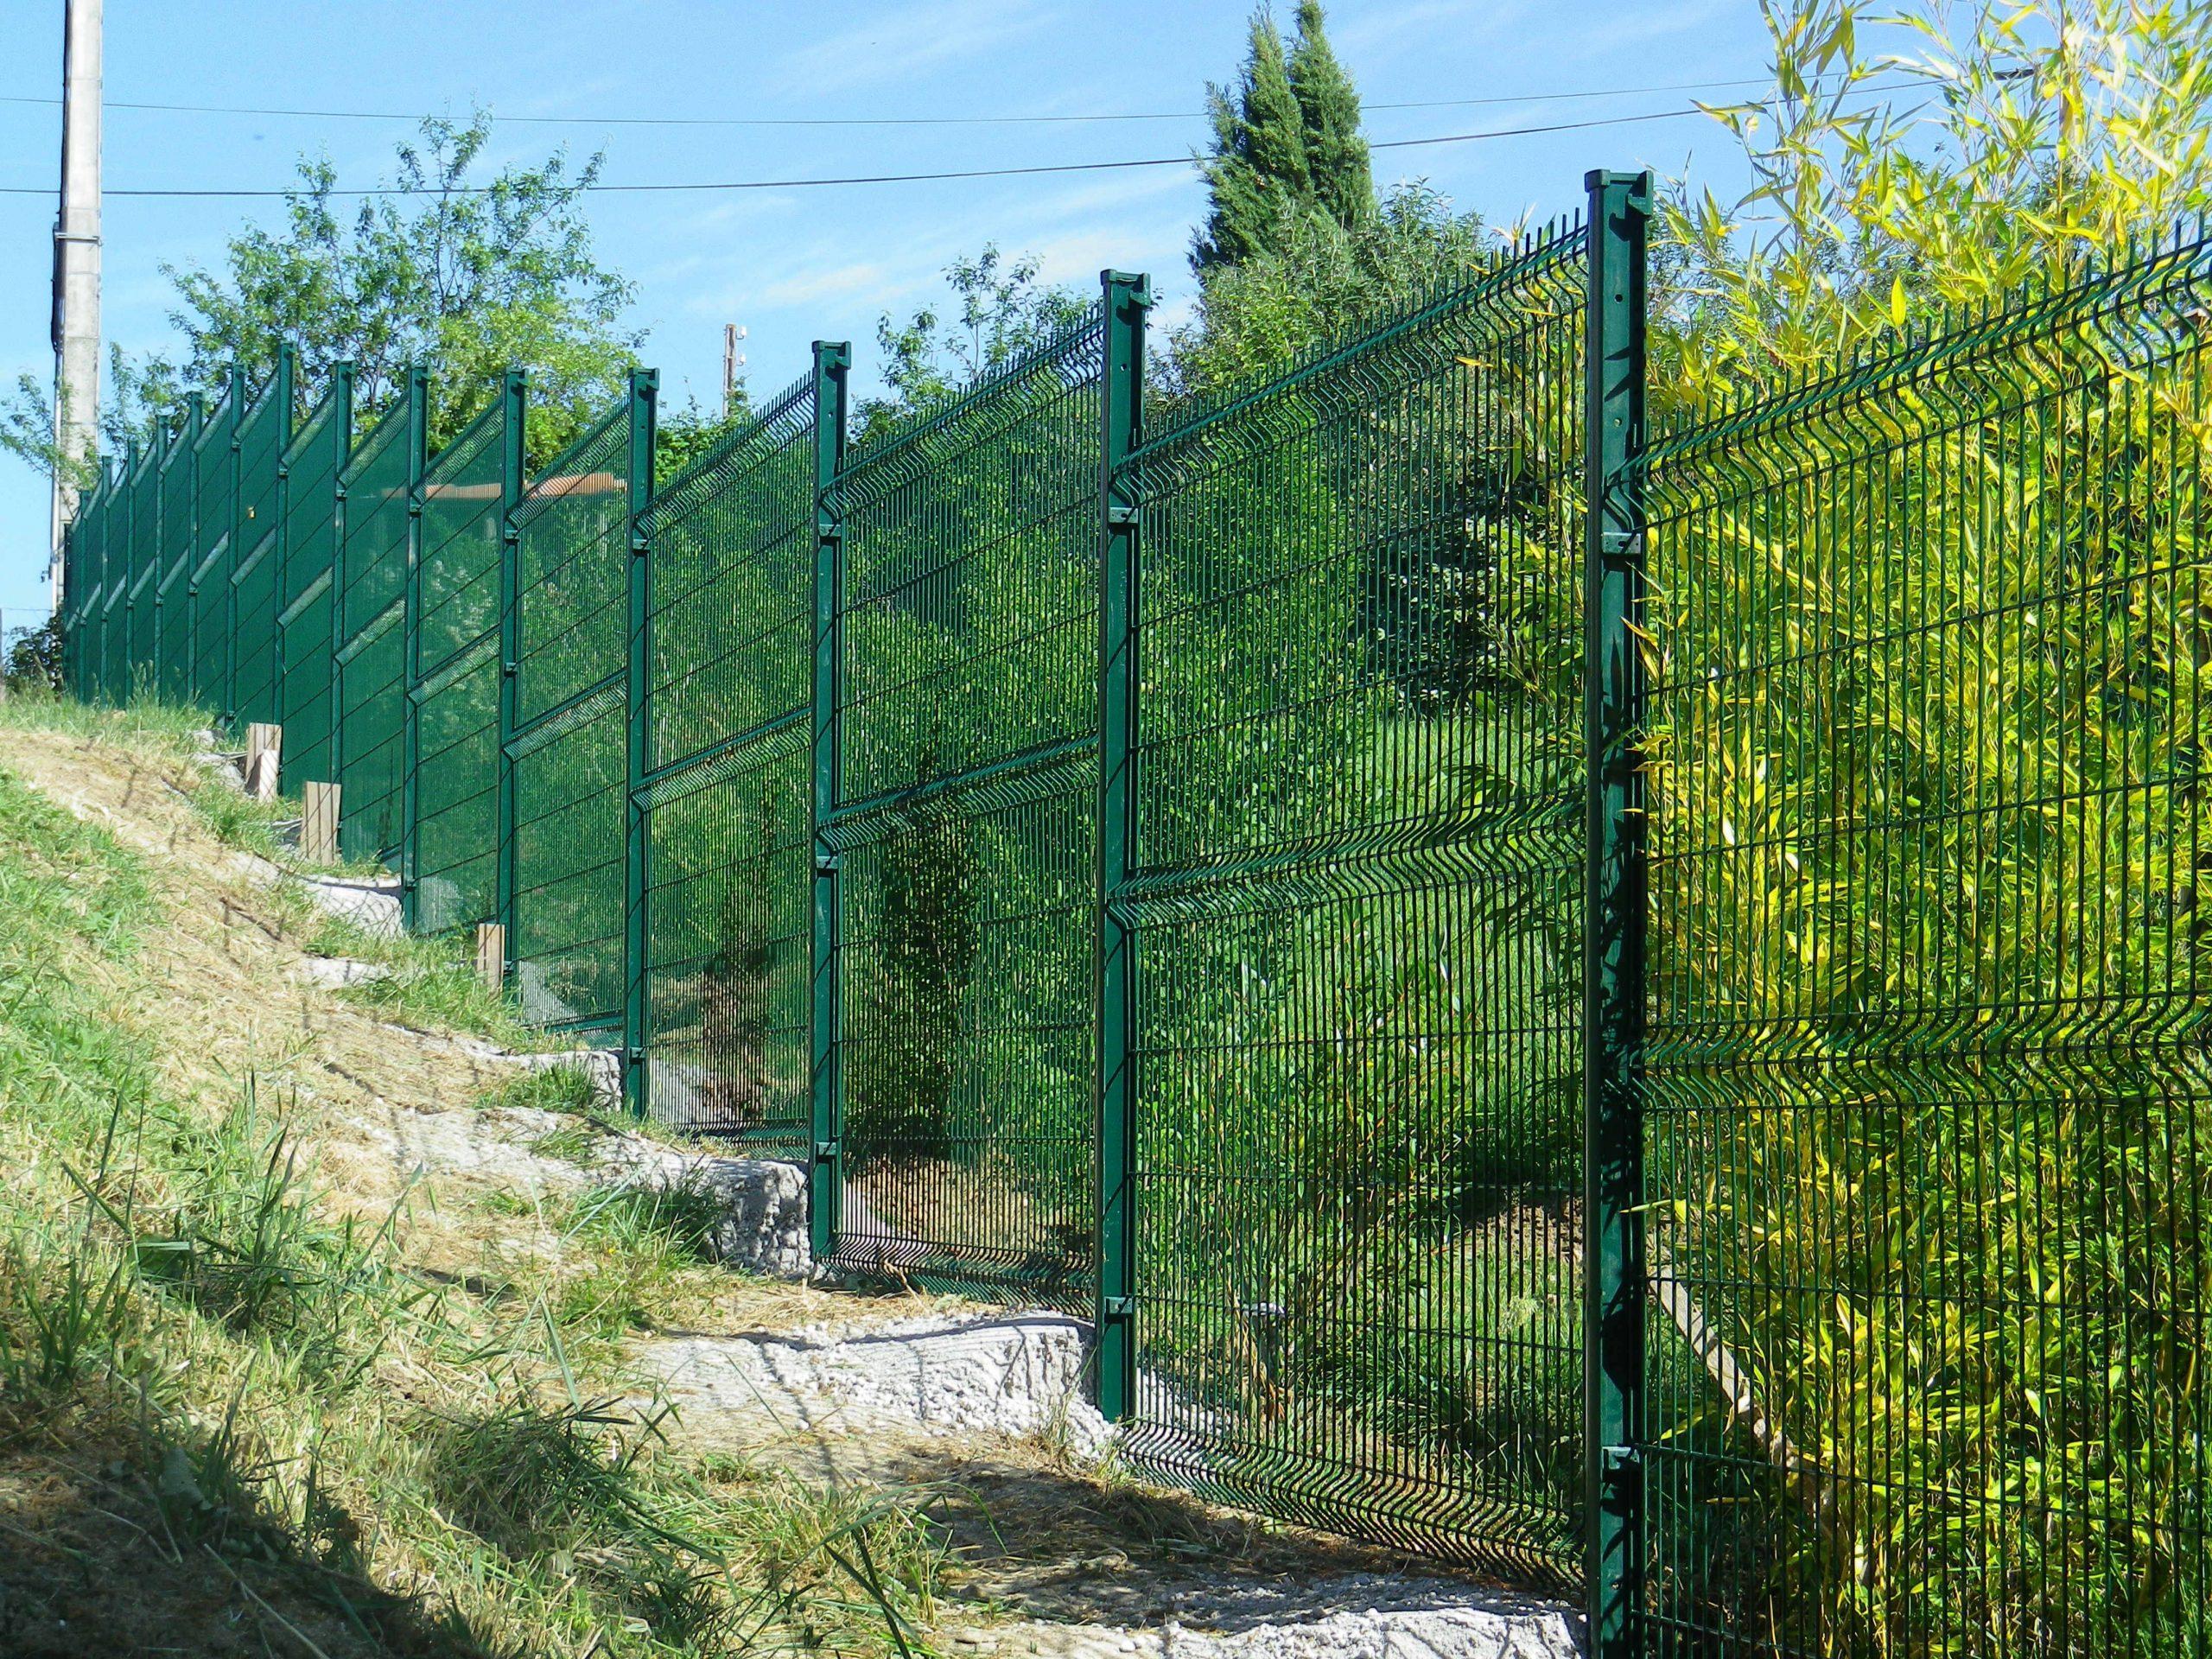 Clôture Rigide En Pente | Cloture Rigide, Amenagement Jardin ... concernant Cloture Jardin Grillage Rigide